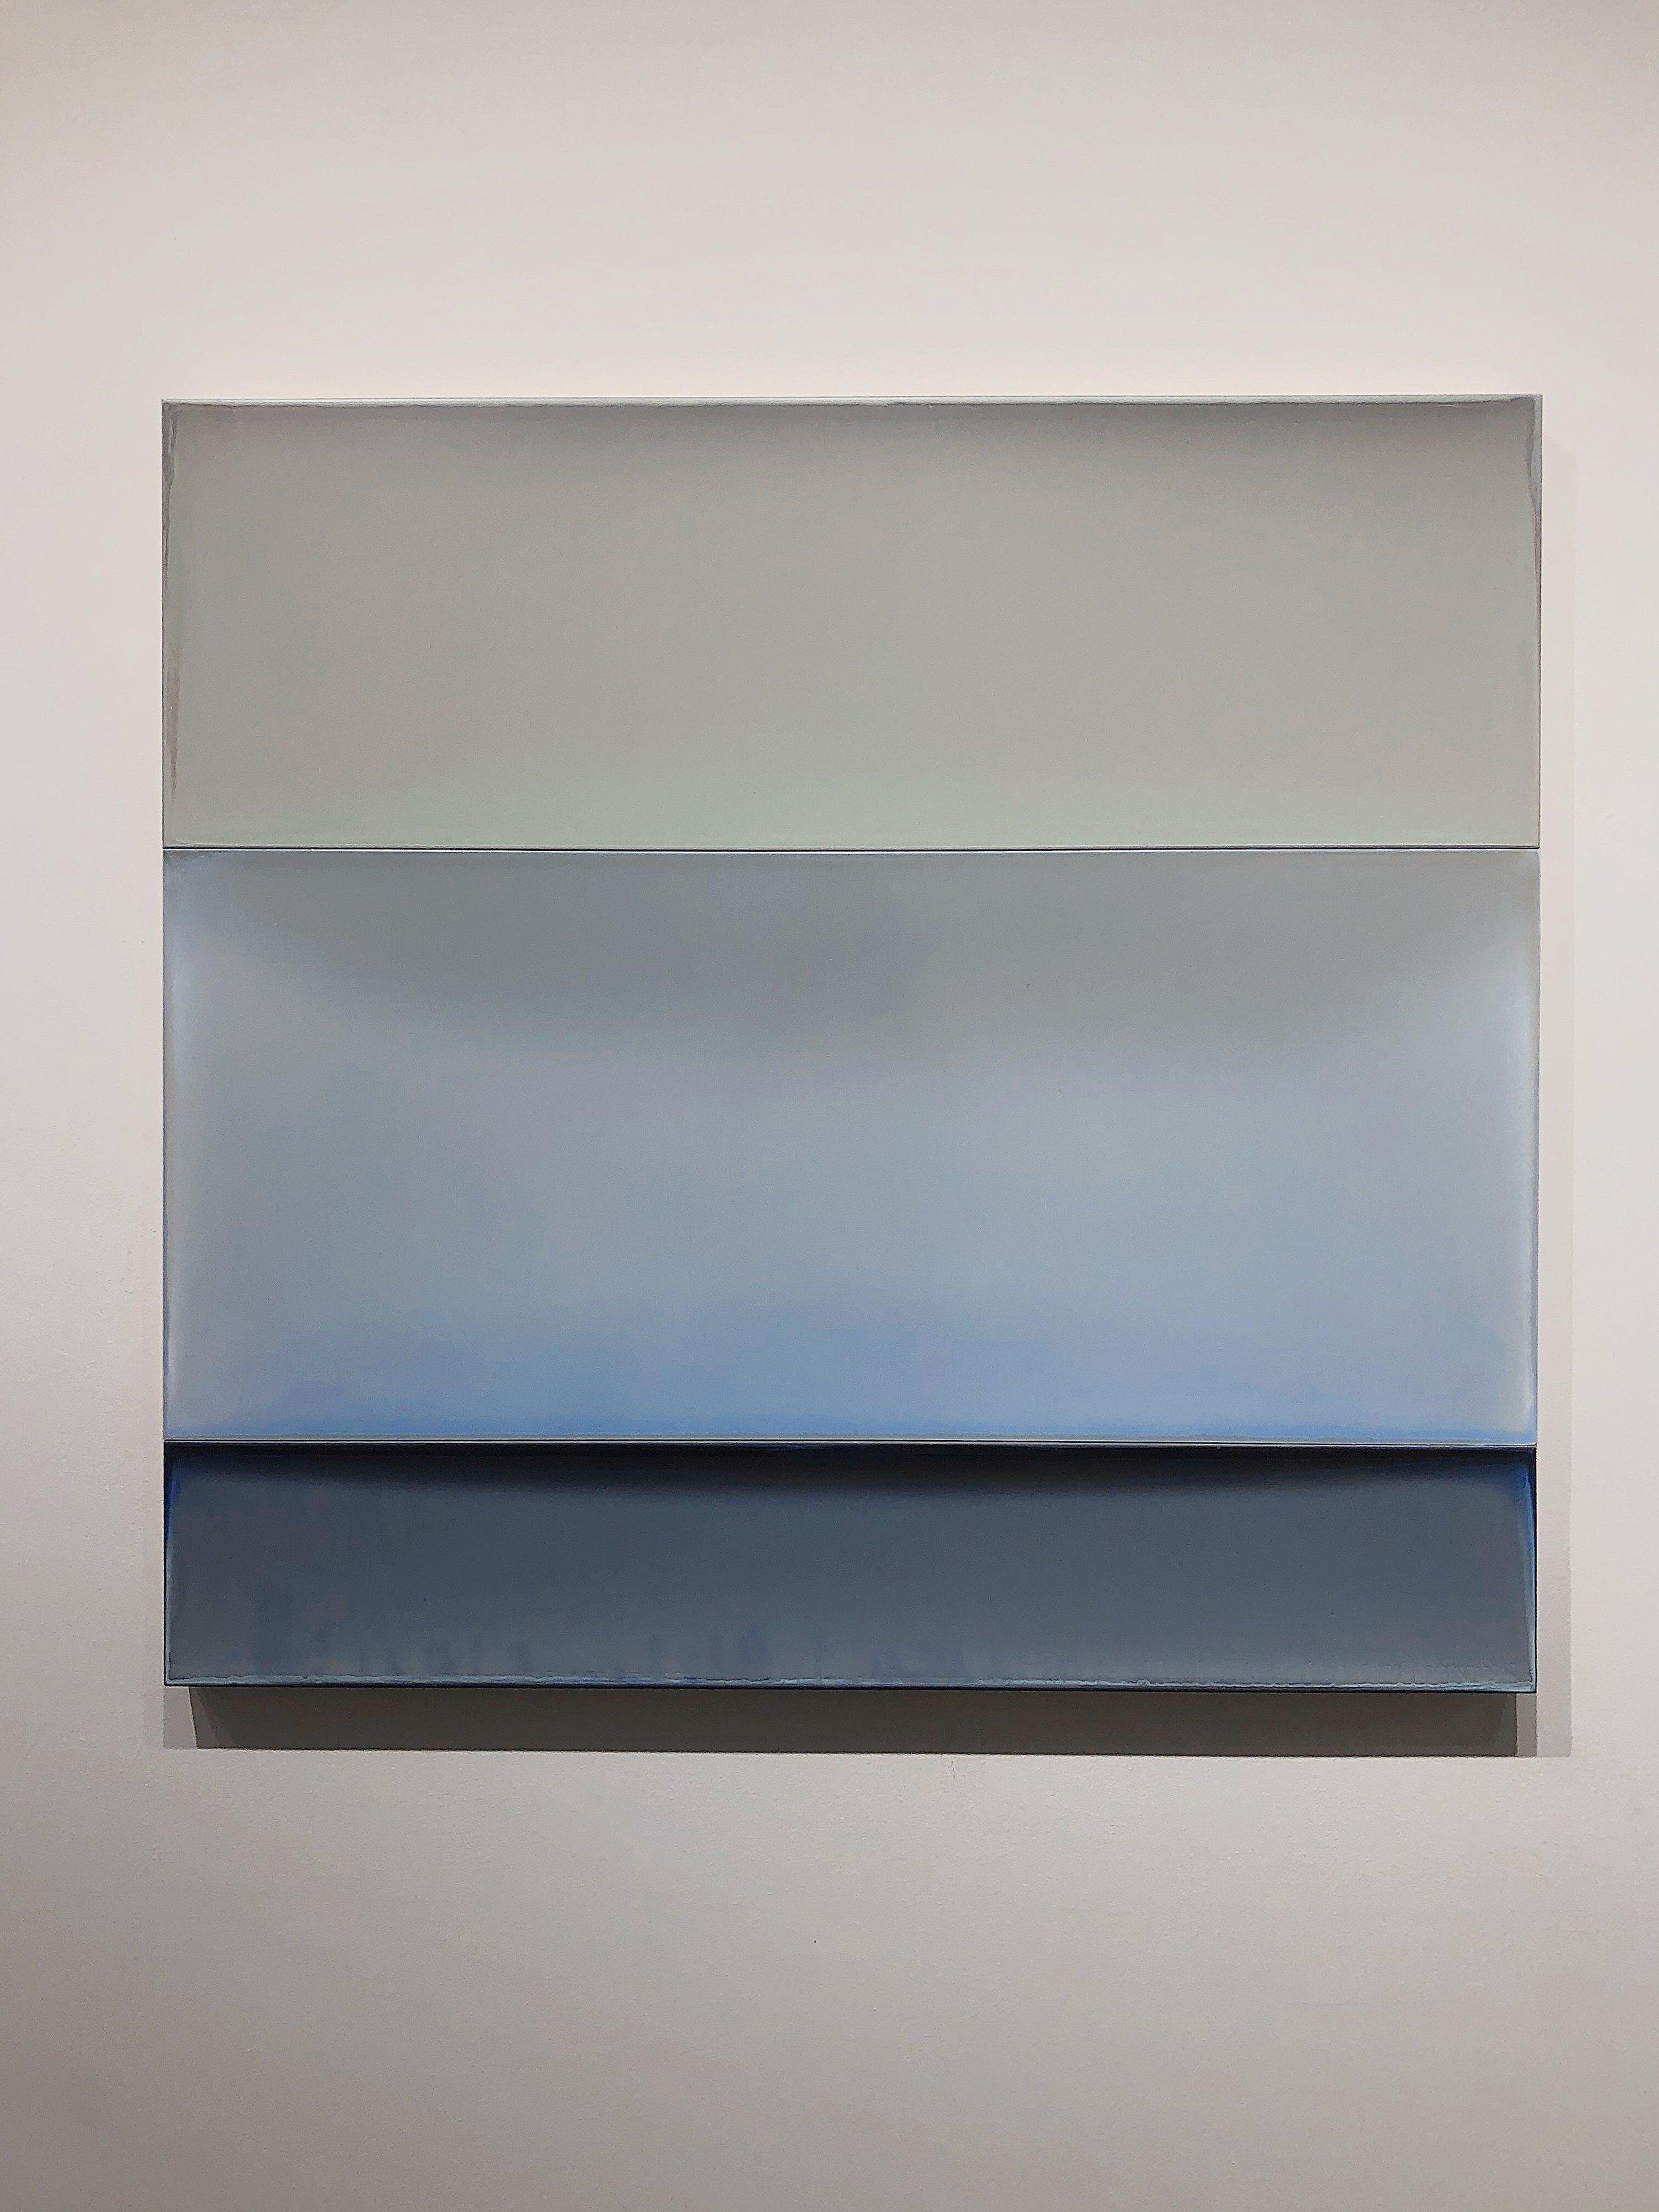 Susan English,  Verge,  tinted polymer on aluminum